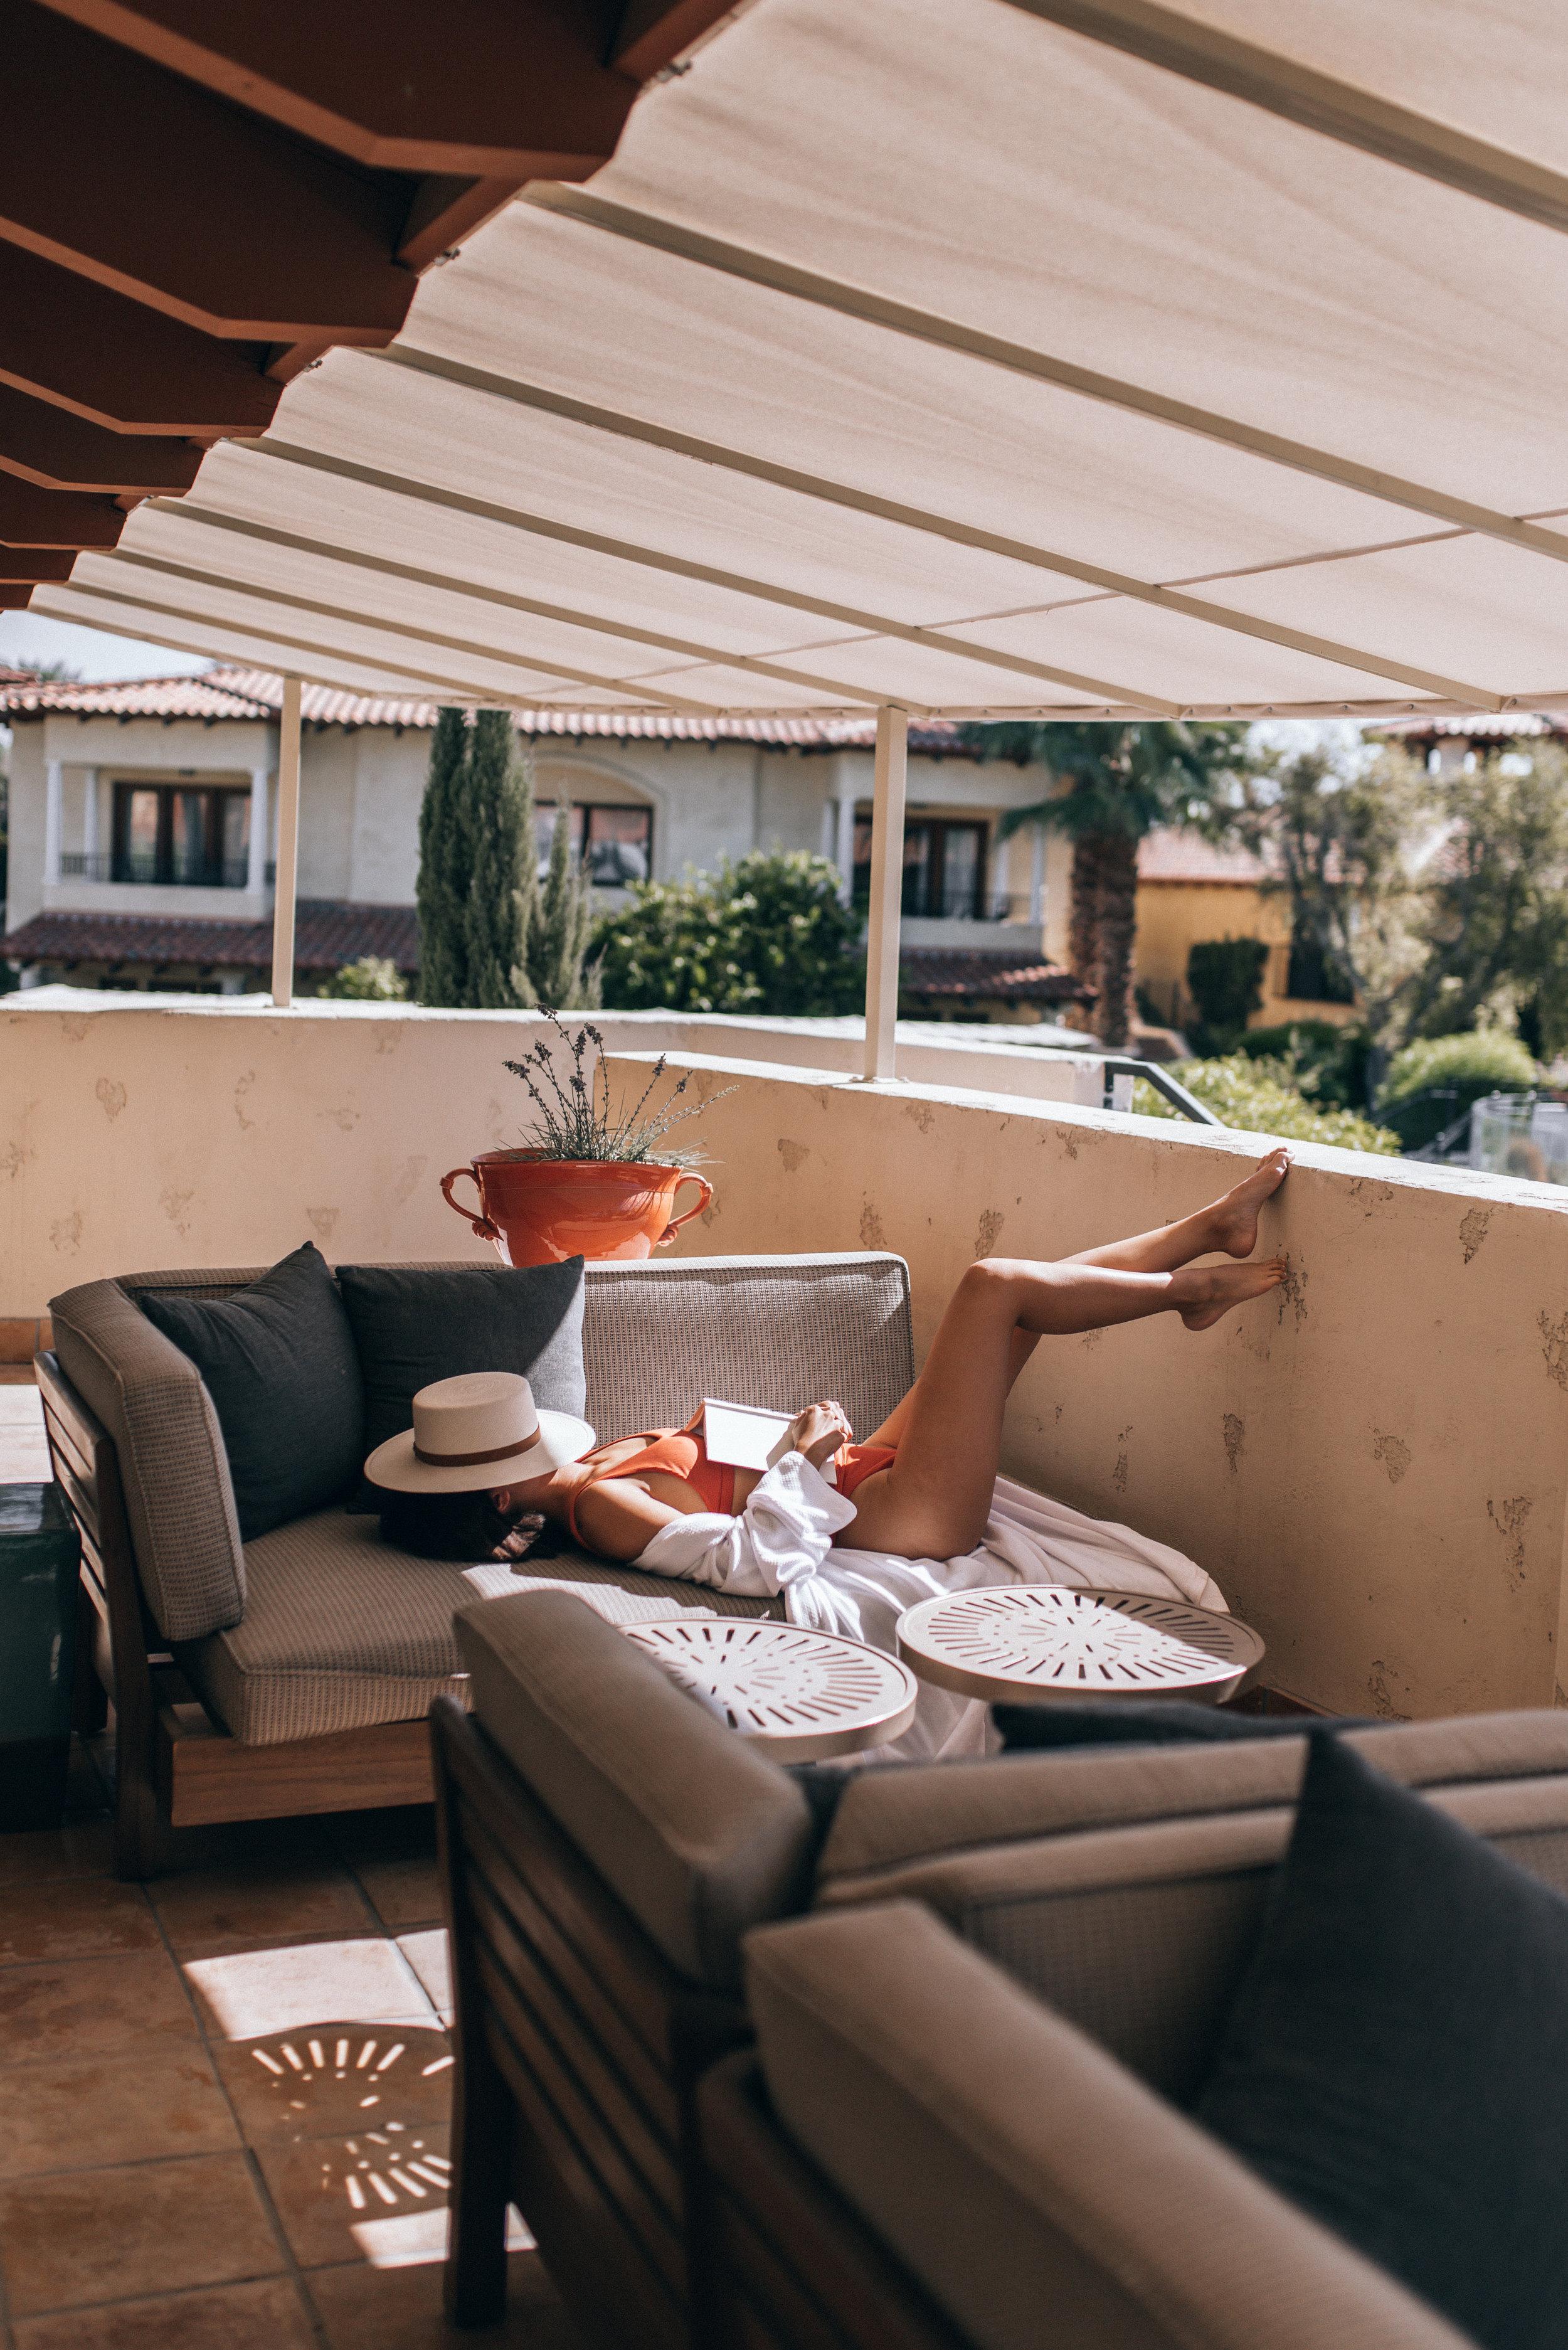 miramonte-spa-resort-by-lisa-linh